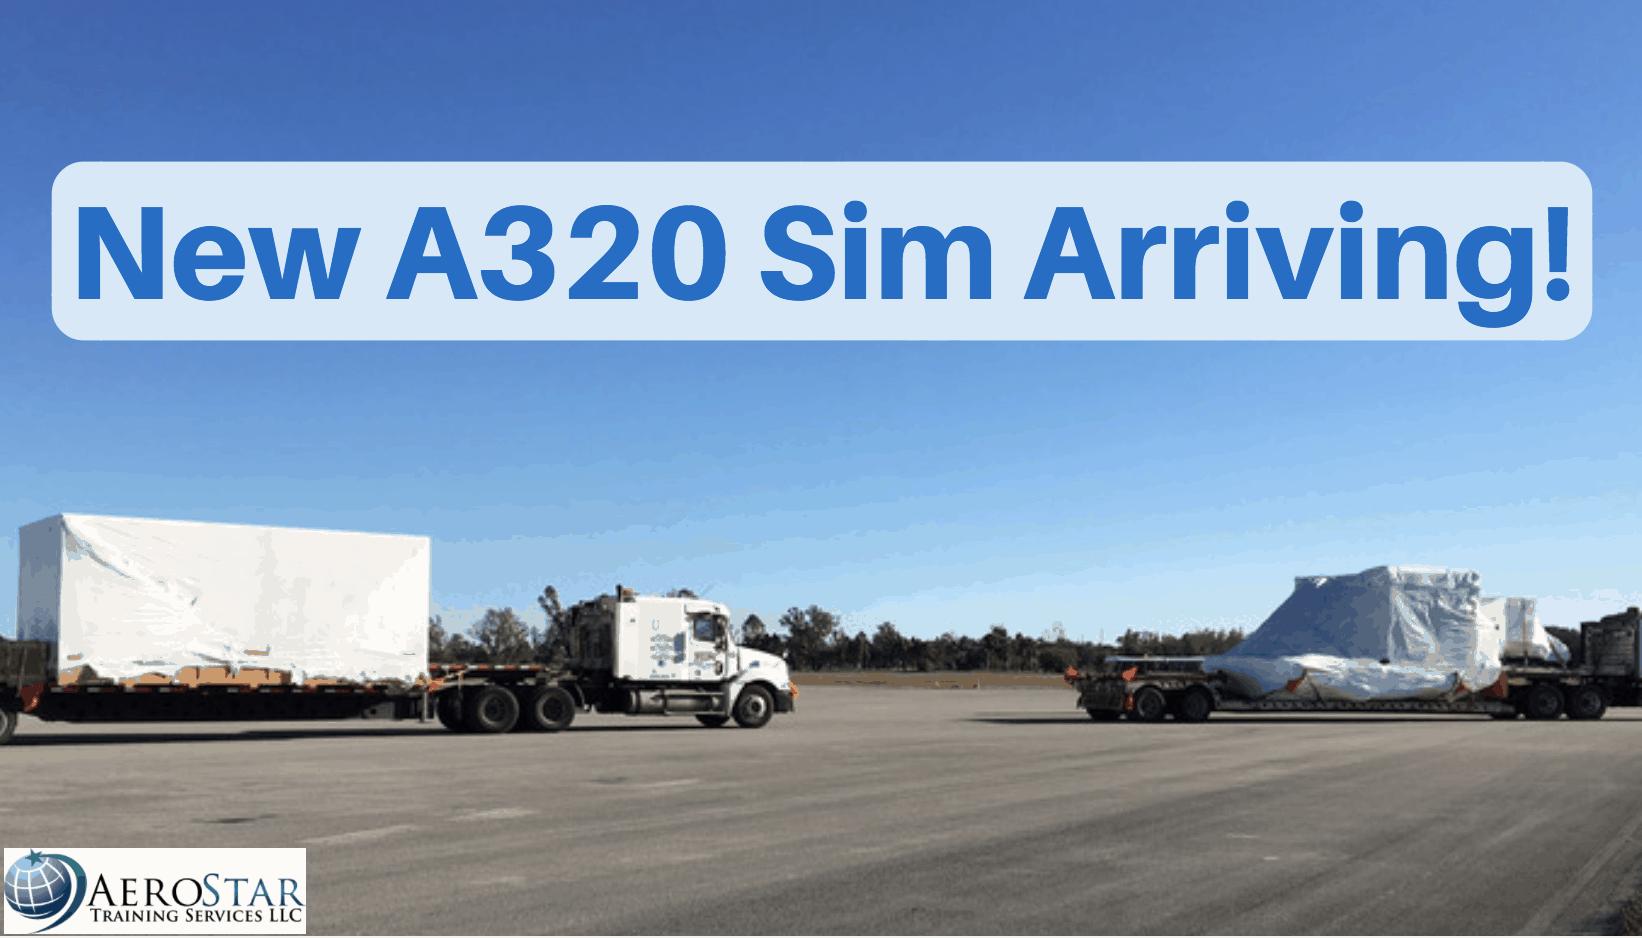 new a320 sim